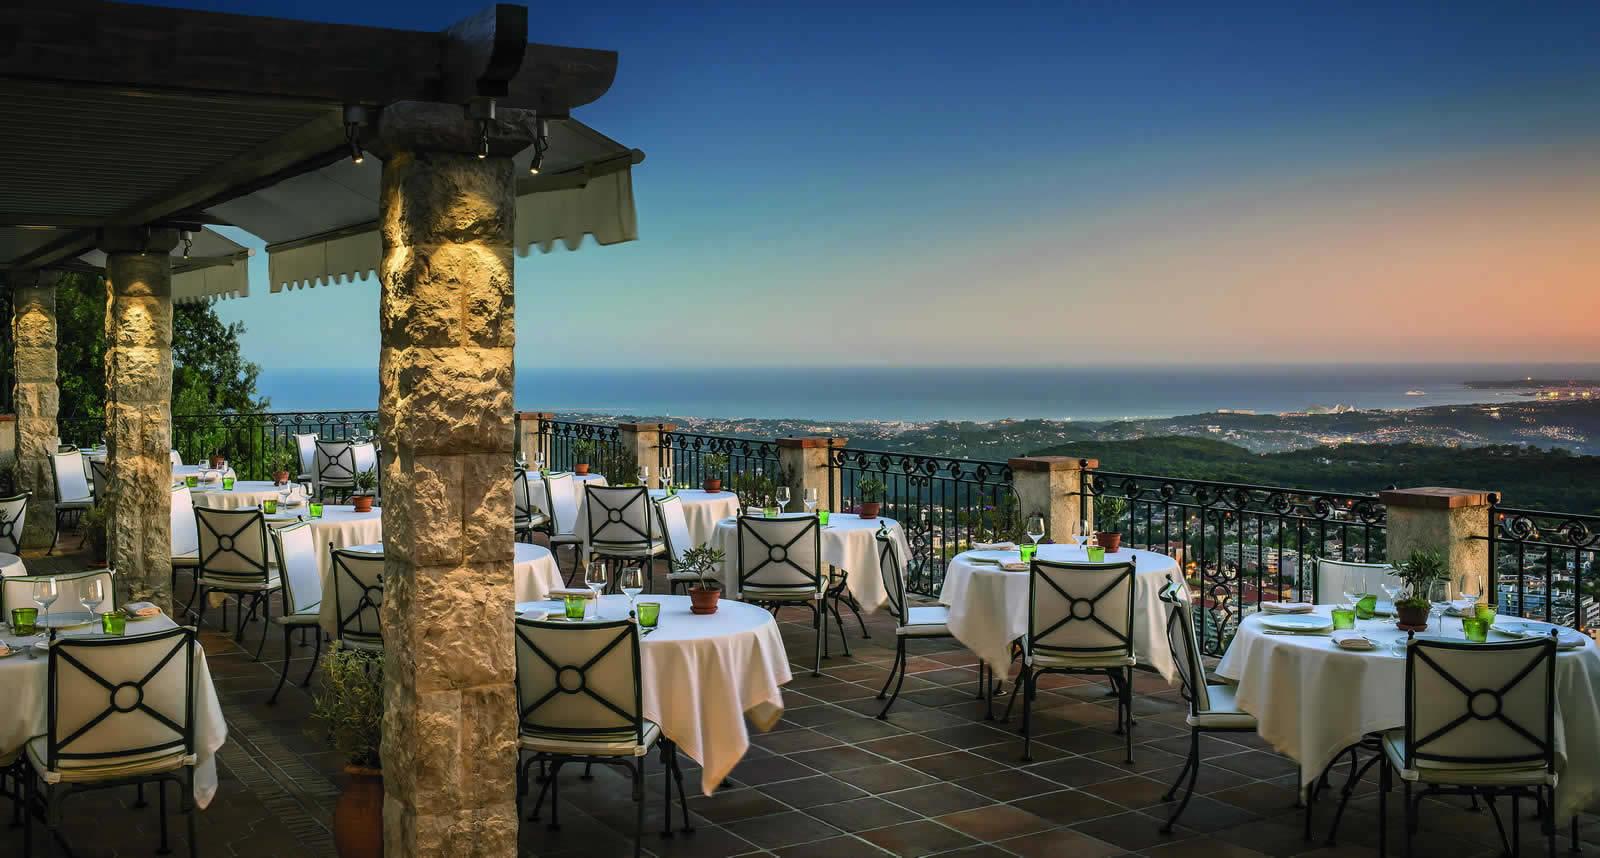 chateau-saint-martin-spa-restaurant-gourmet-refined-cuisine-jean-luc-lefrancois